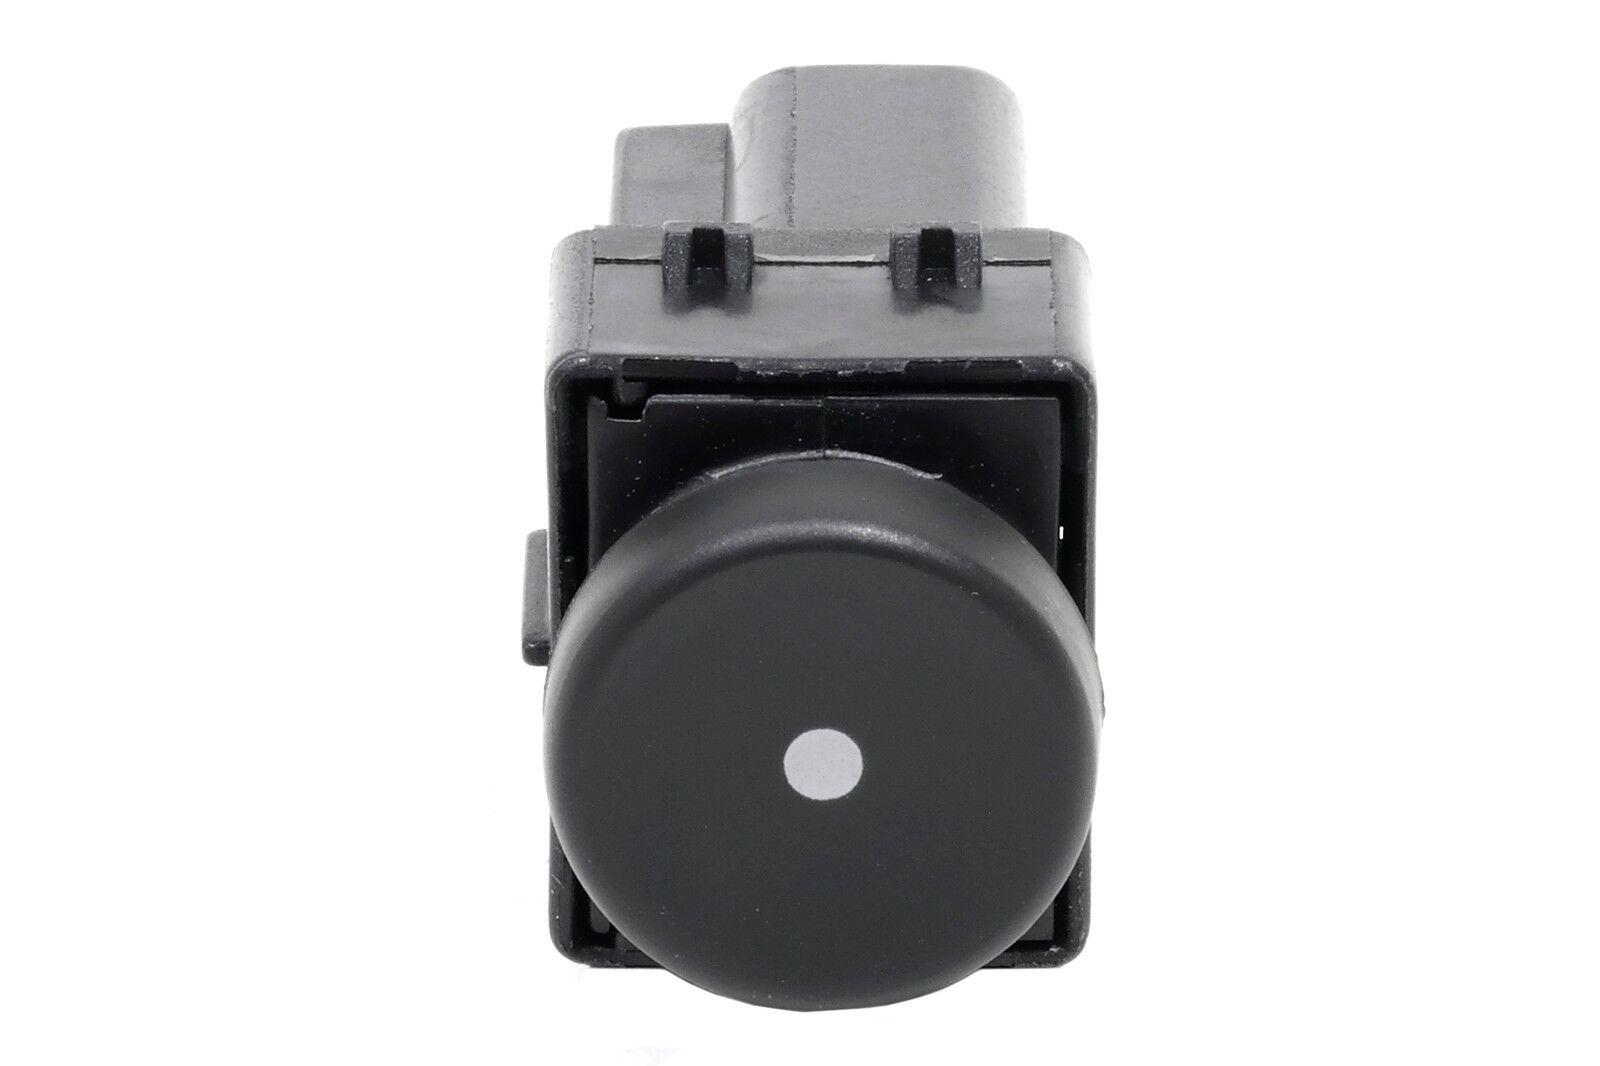 NGK NTK Upstream O2 Oxygen Sensor for 2000-2011 Hyundai Accent 1.6L 1.5L L4 lu